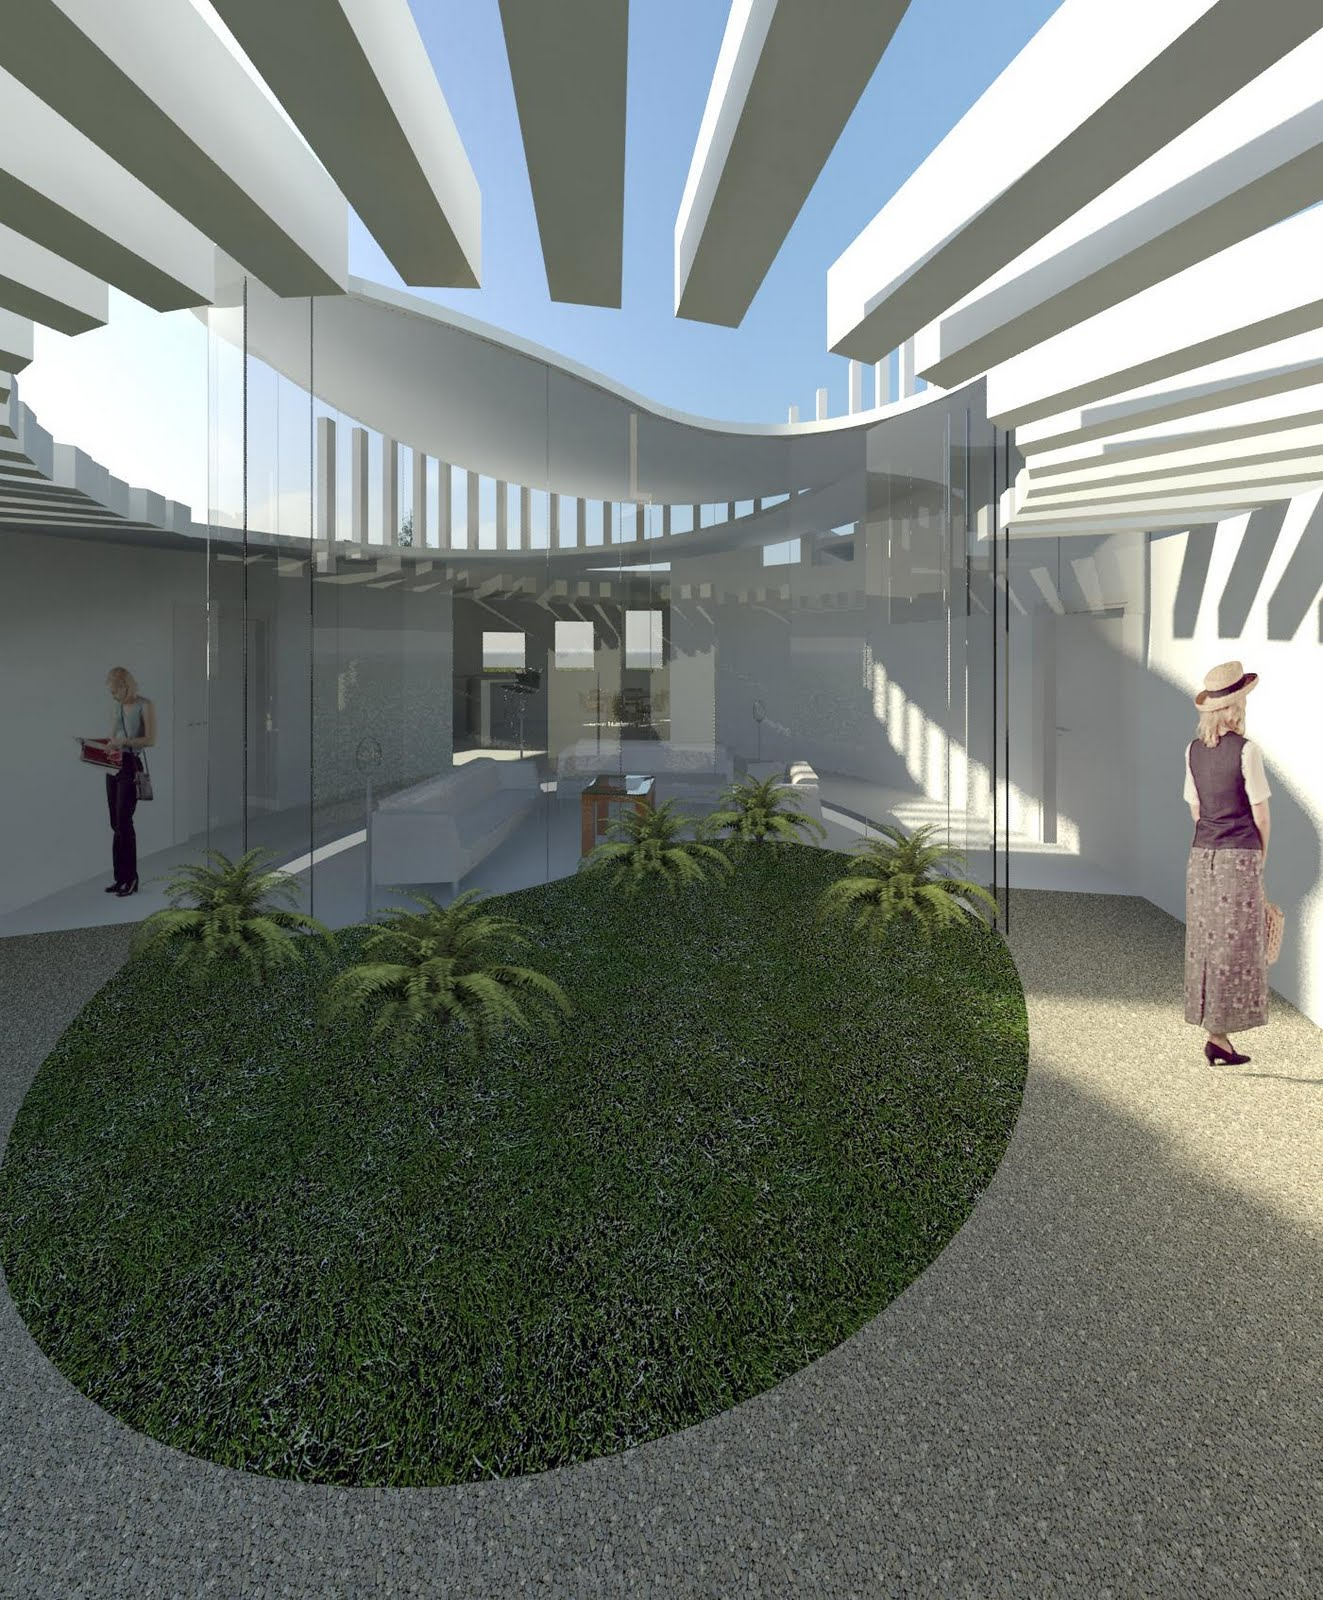 Proyecto equipo 2 dise o casa habitacion sin limites 2d for Diseno estructural de casa habitacion